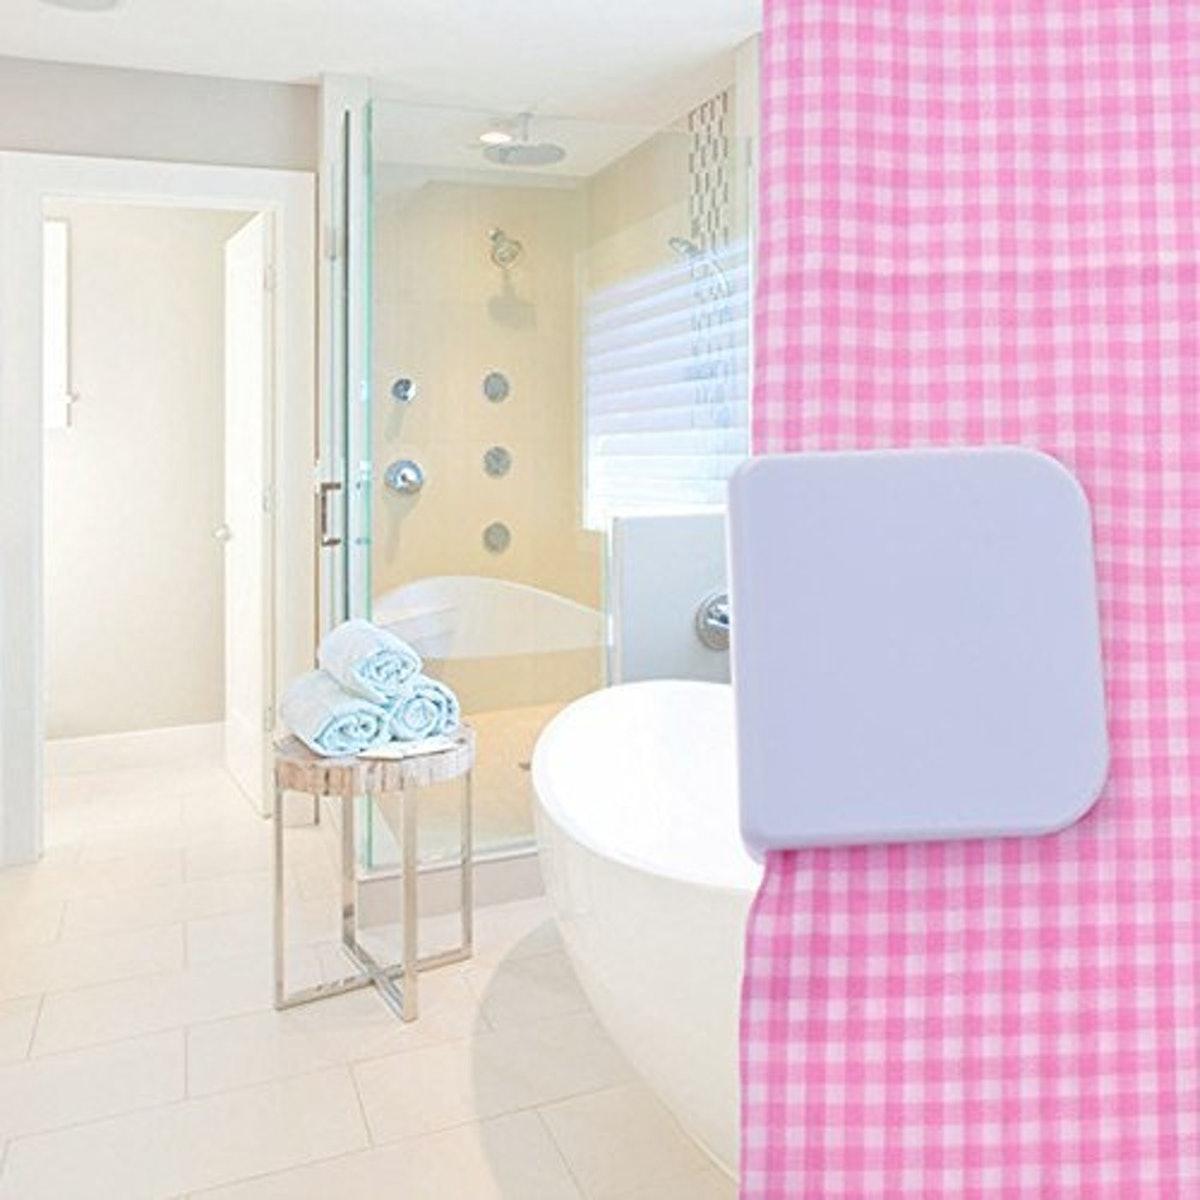 LGDehome Shower Splash Clips (6 Pack)